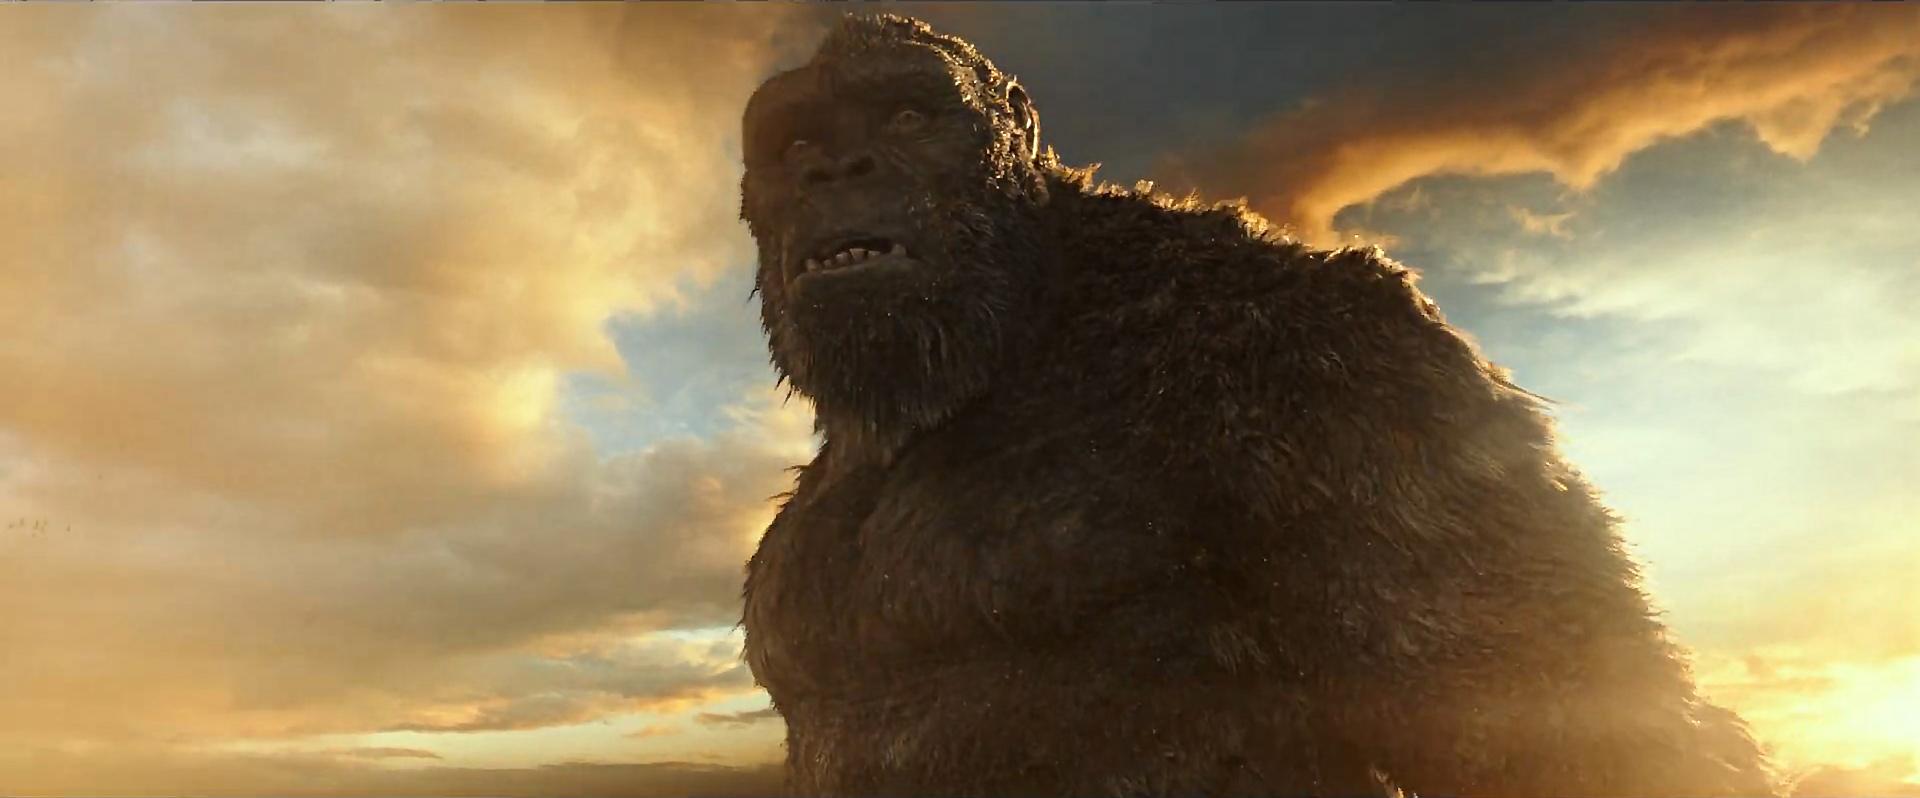 Godzilla vs Kong Trailer Still 34 - Kong Rises